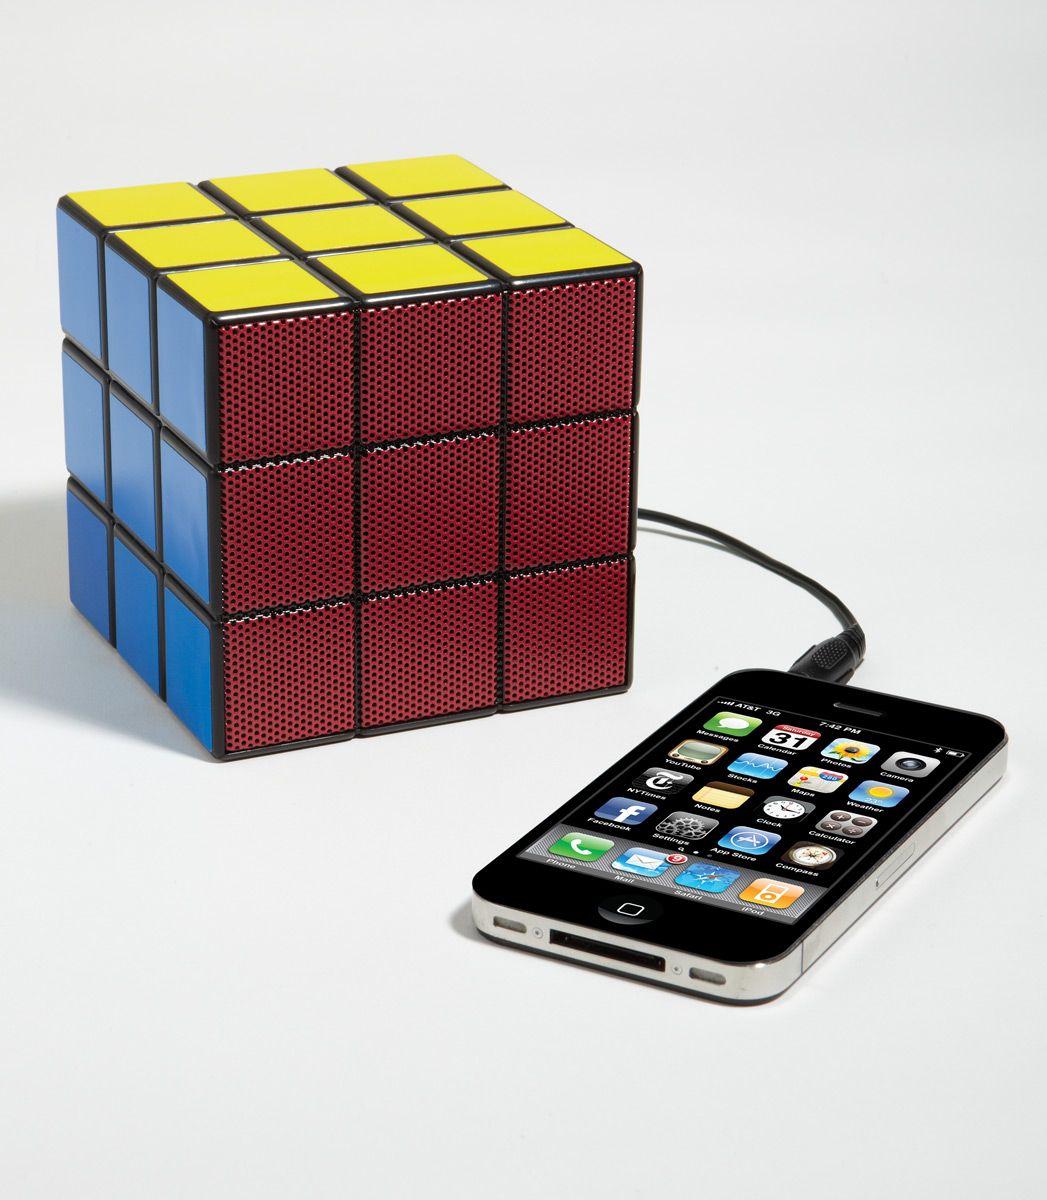 Great Rubiku0027s Cube SpeakerYour Music Problems Are Solved! The Rubiku0027s Cube  Speaker Is A Retro, Versatile Sound Blaring Device, Containing A Premium  Grade 5 Watt ... Nice Look